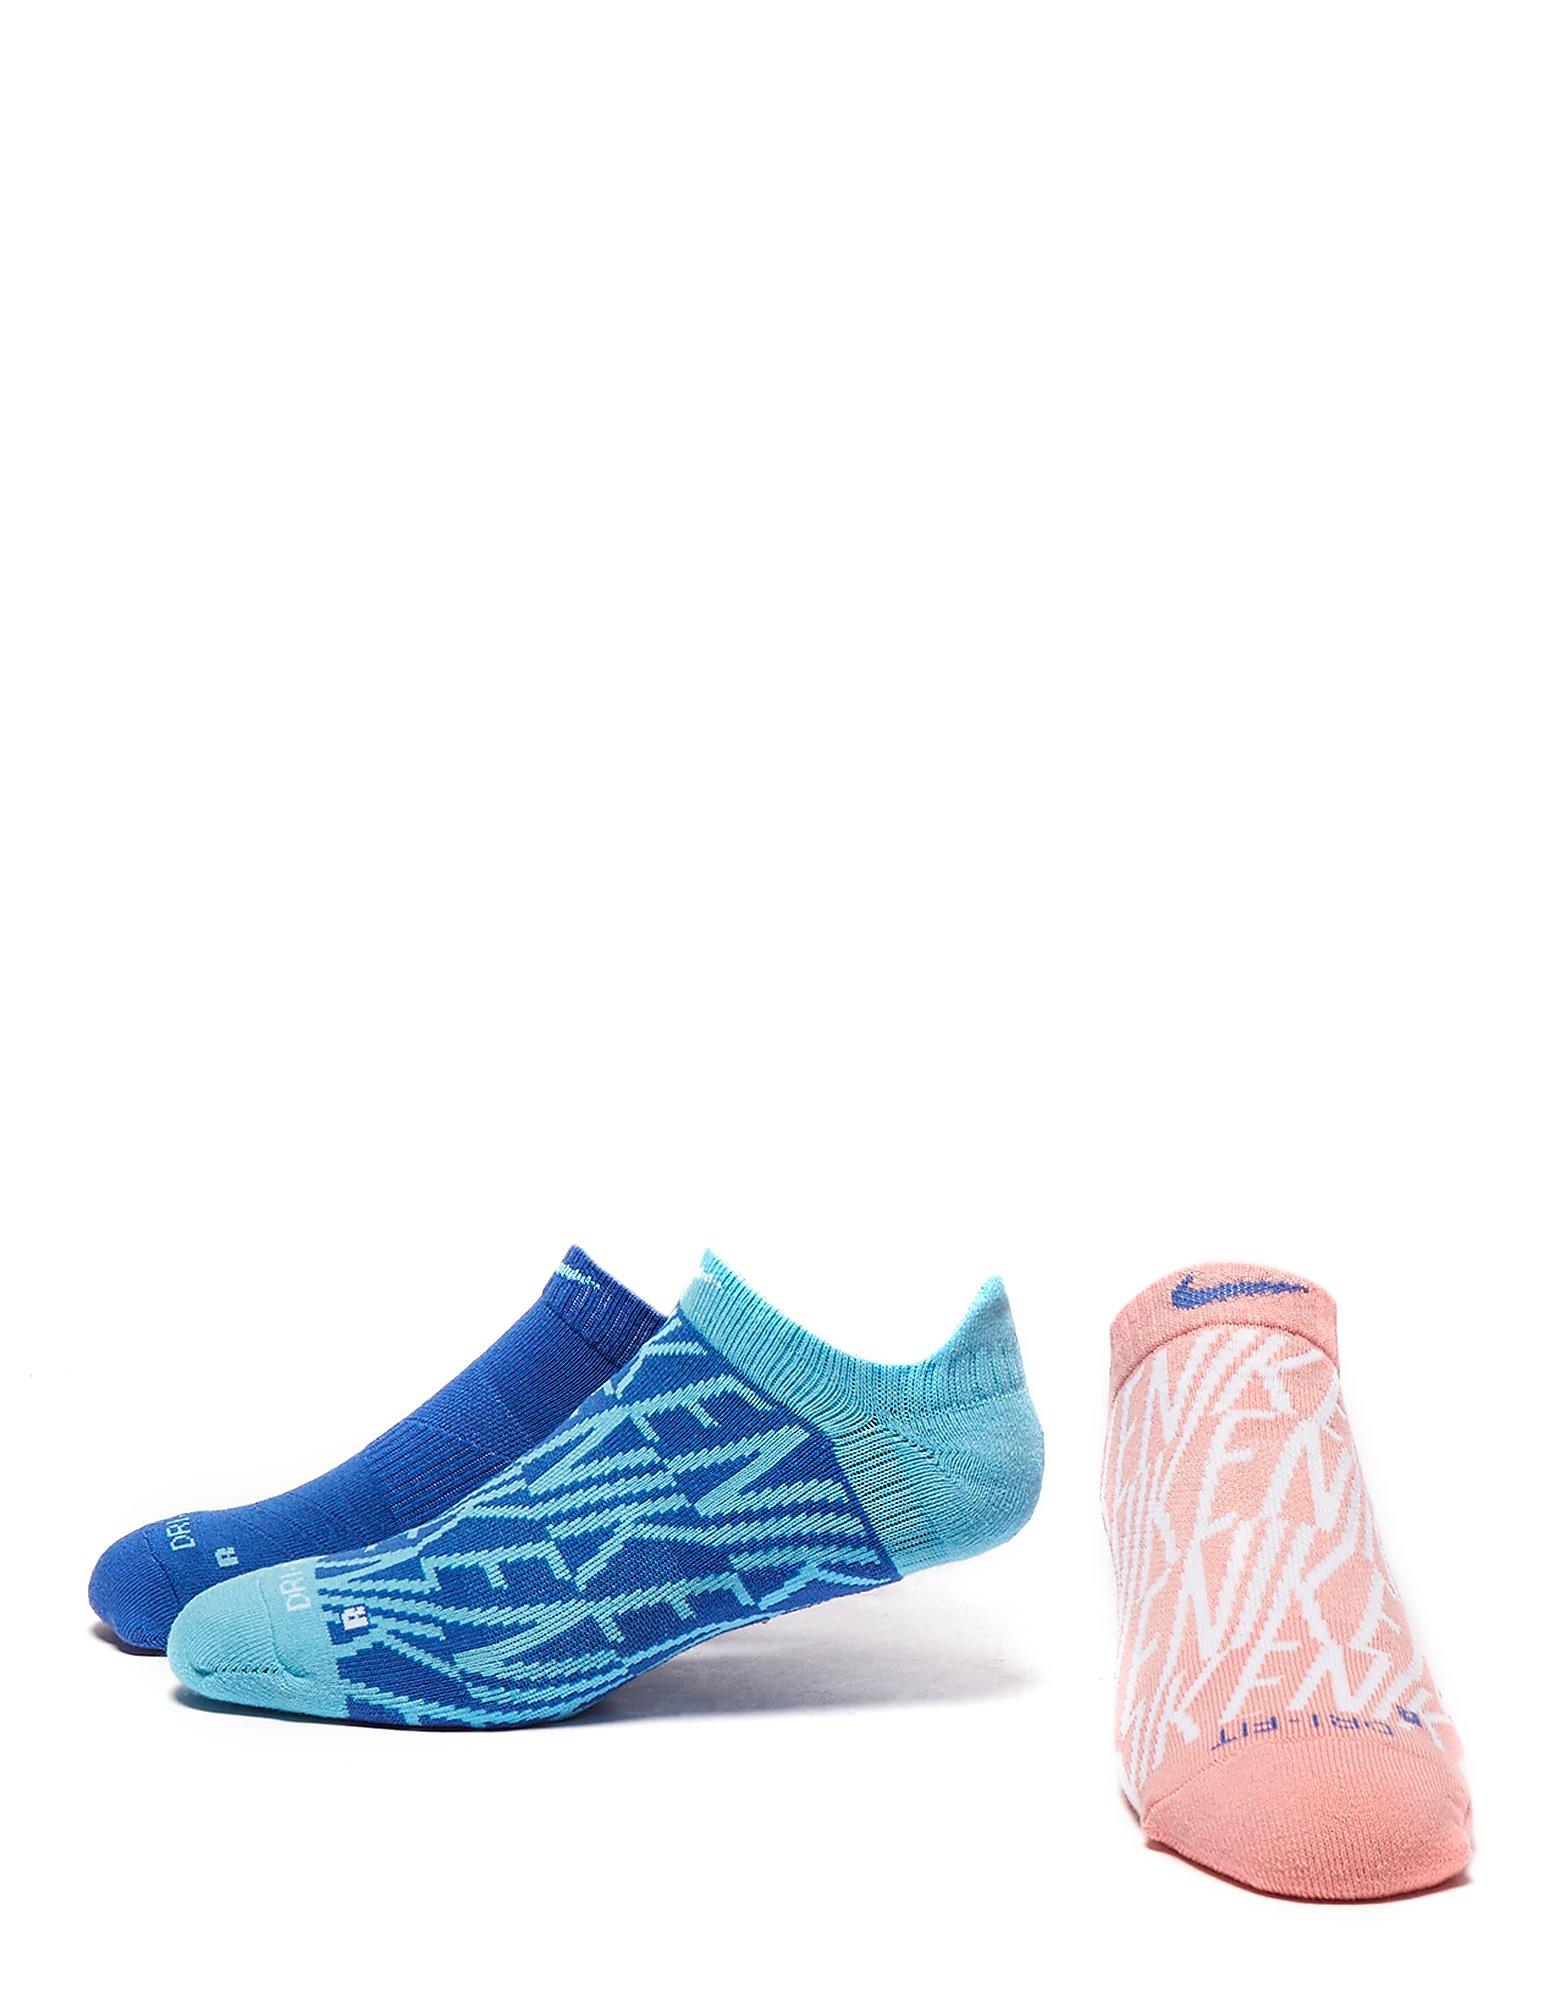 Nike 3 Pack Dri-FIT Cushion Graphic No Show Socks